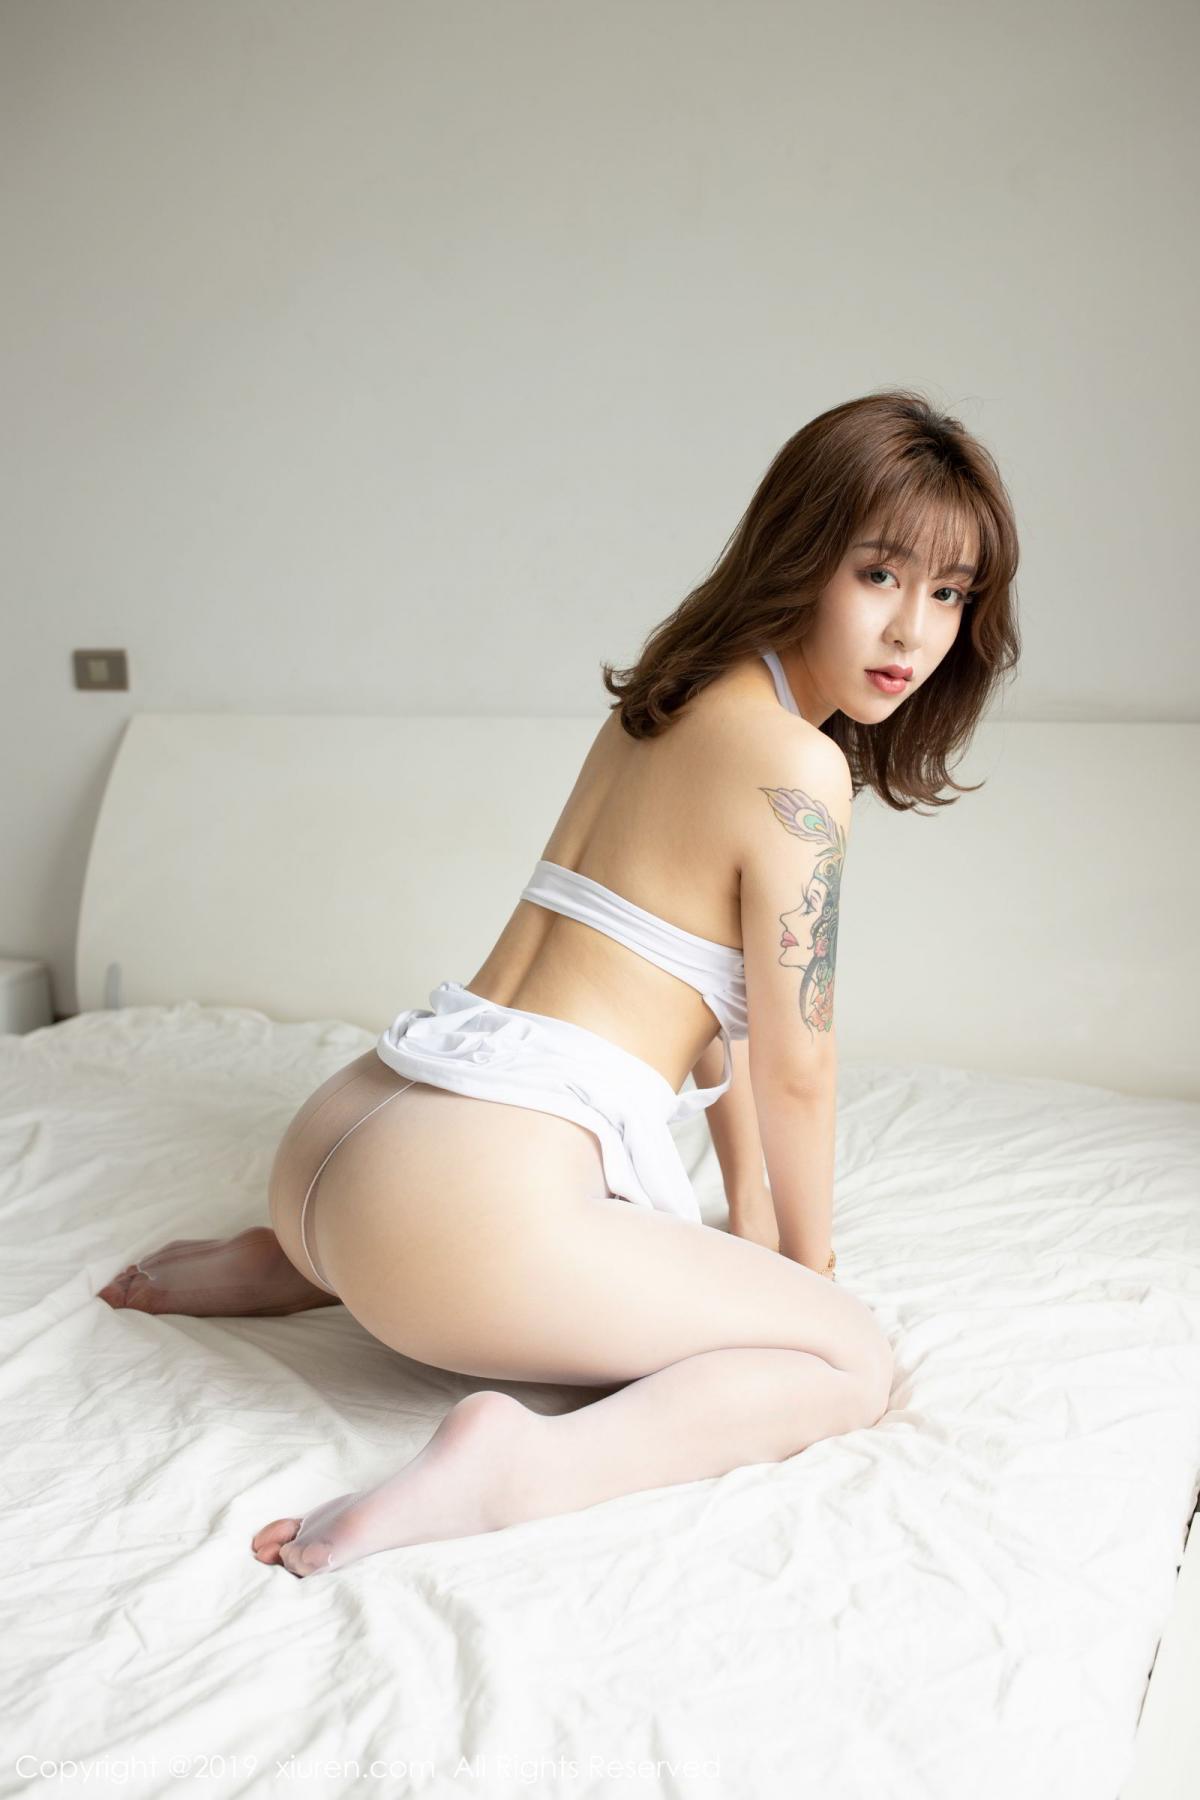 [XiuRen] Vol.1639 Nuo Mi Nm 2P, Nuo Mi NM, Nurse, Xiuren